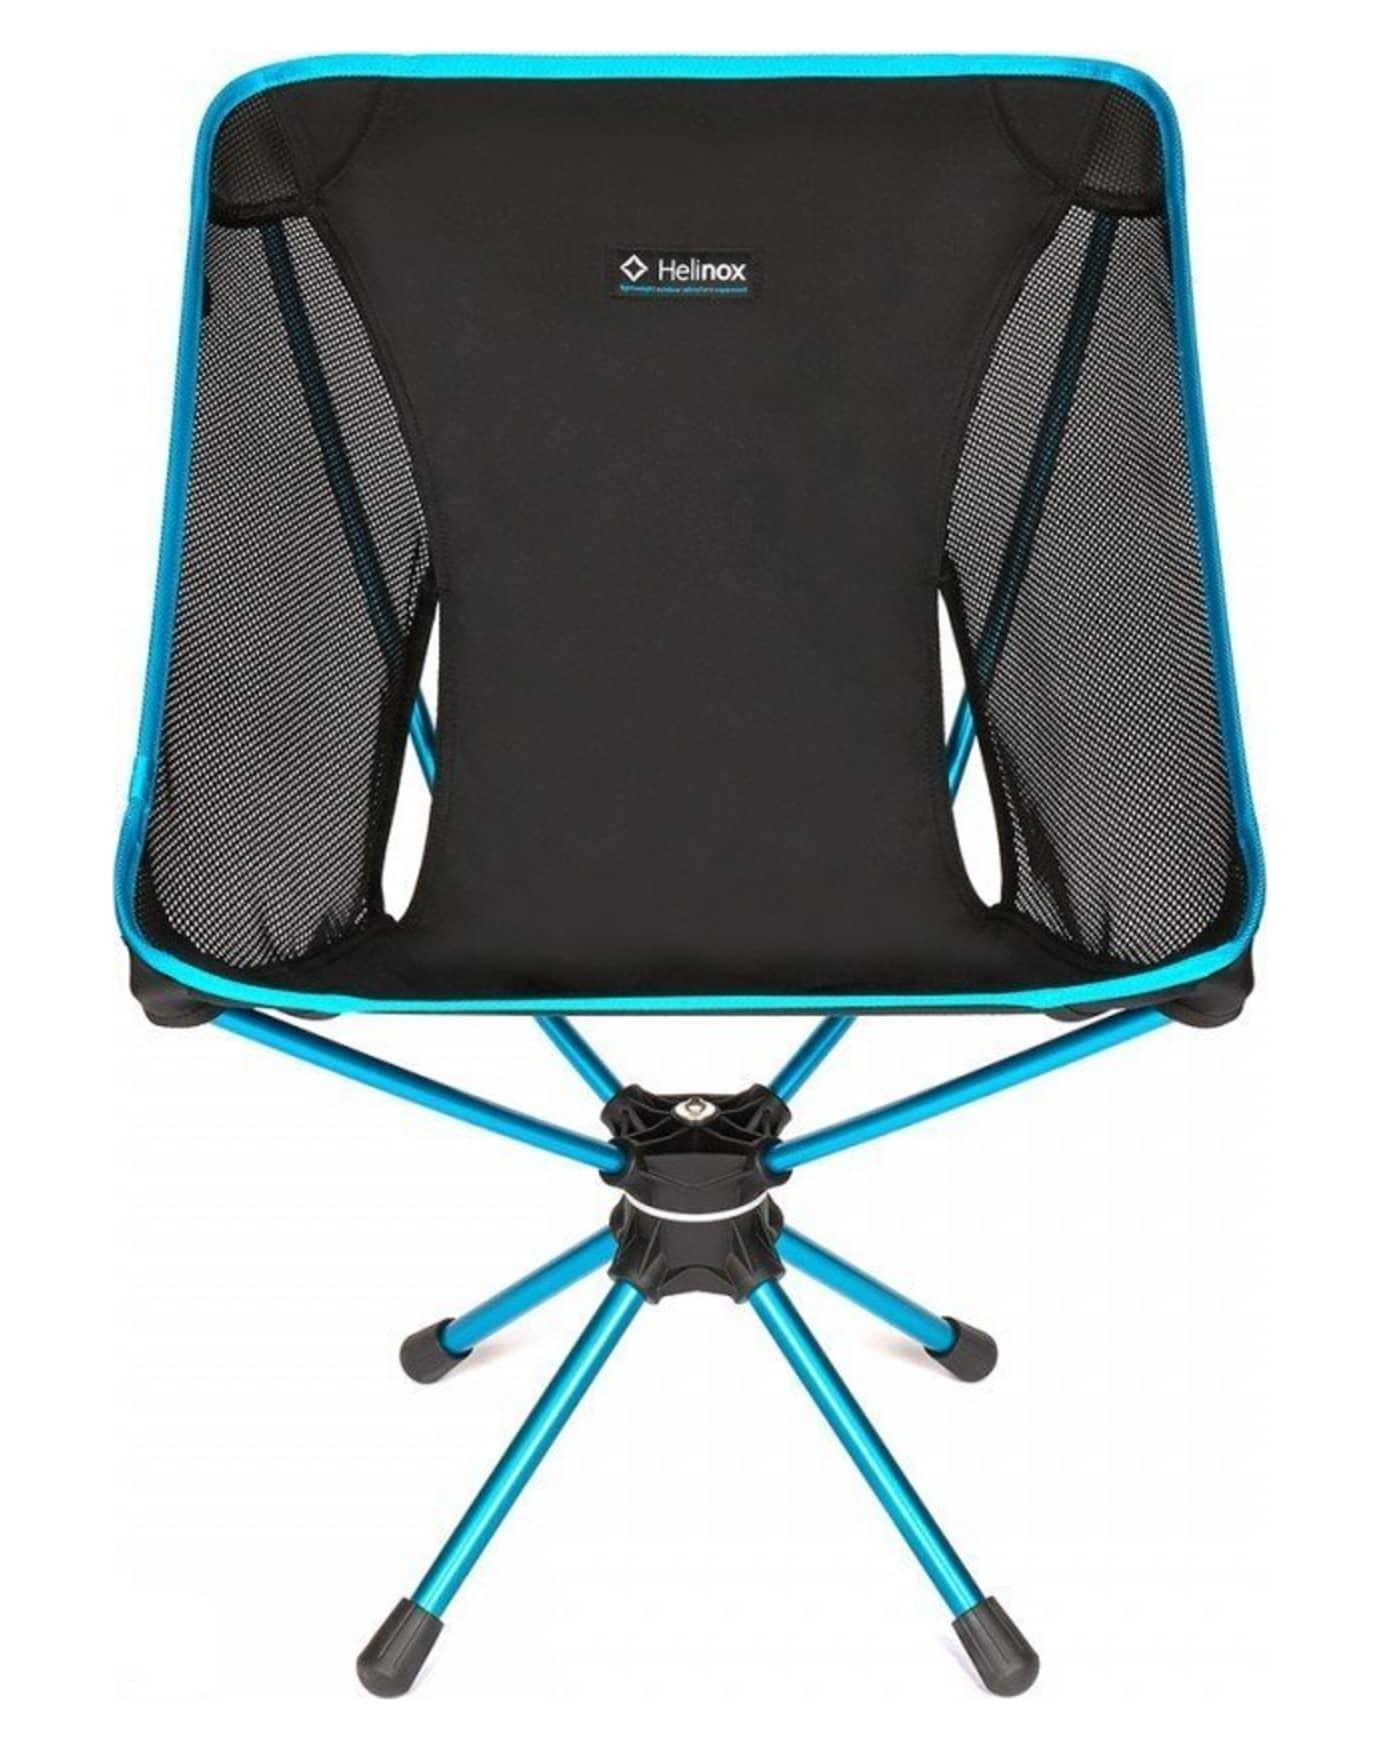 yeti folding chair reception room chairs big agnes helinox swivel black